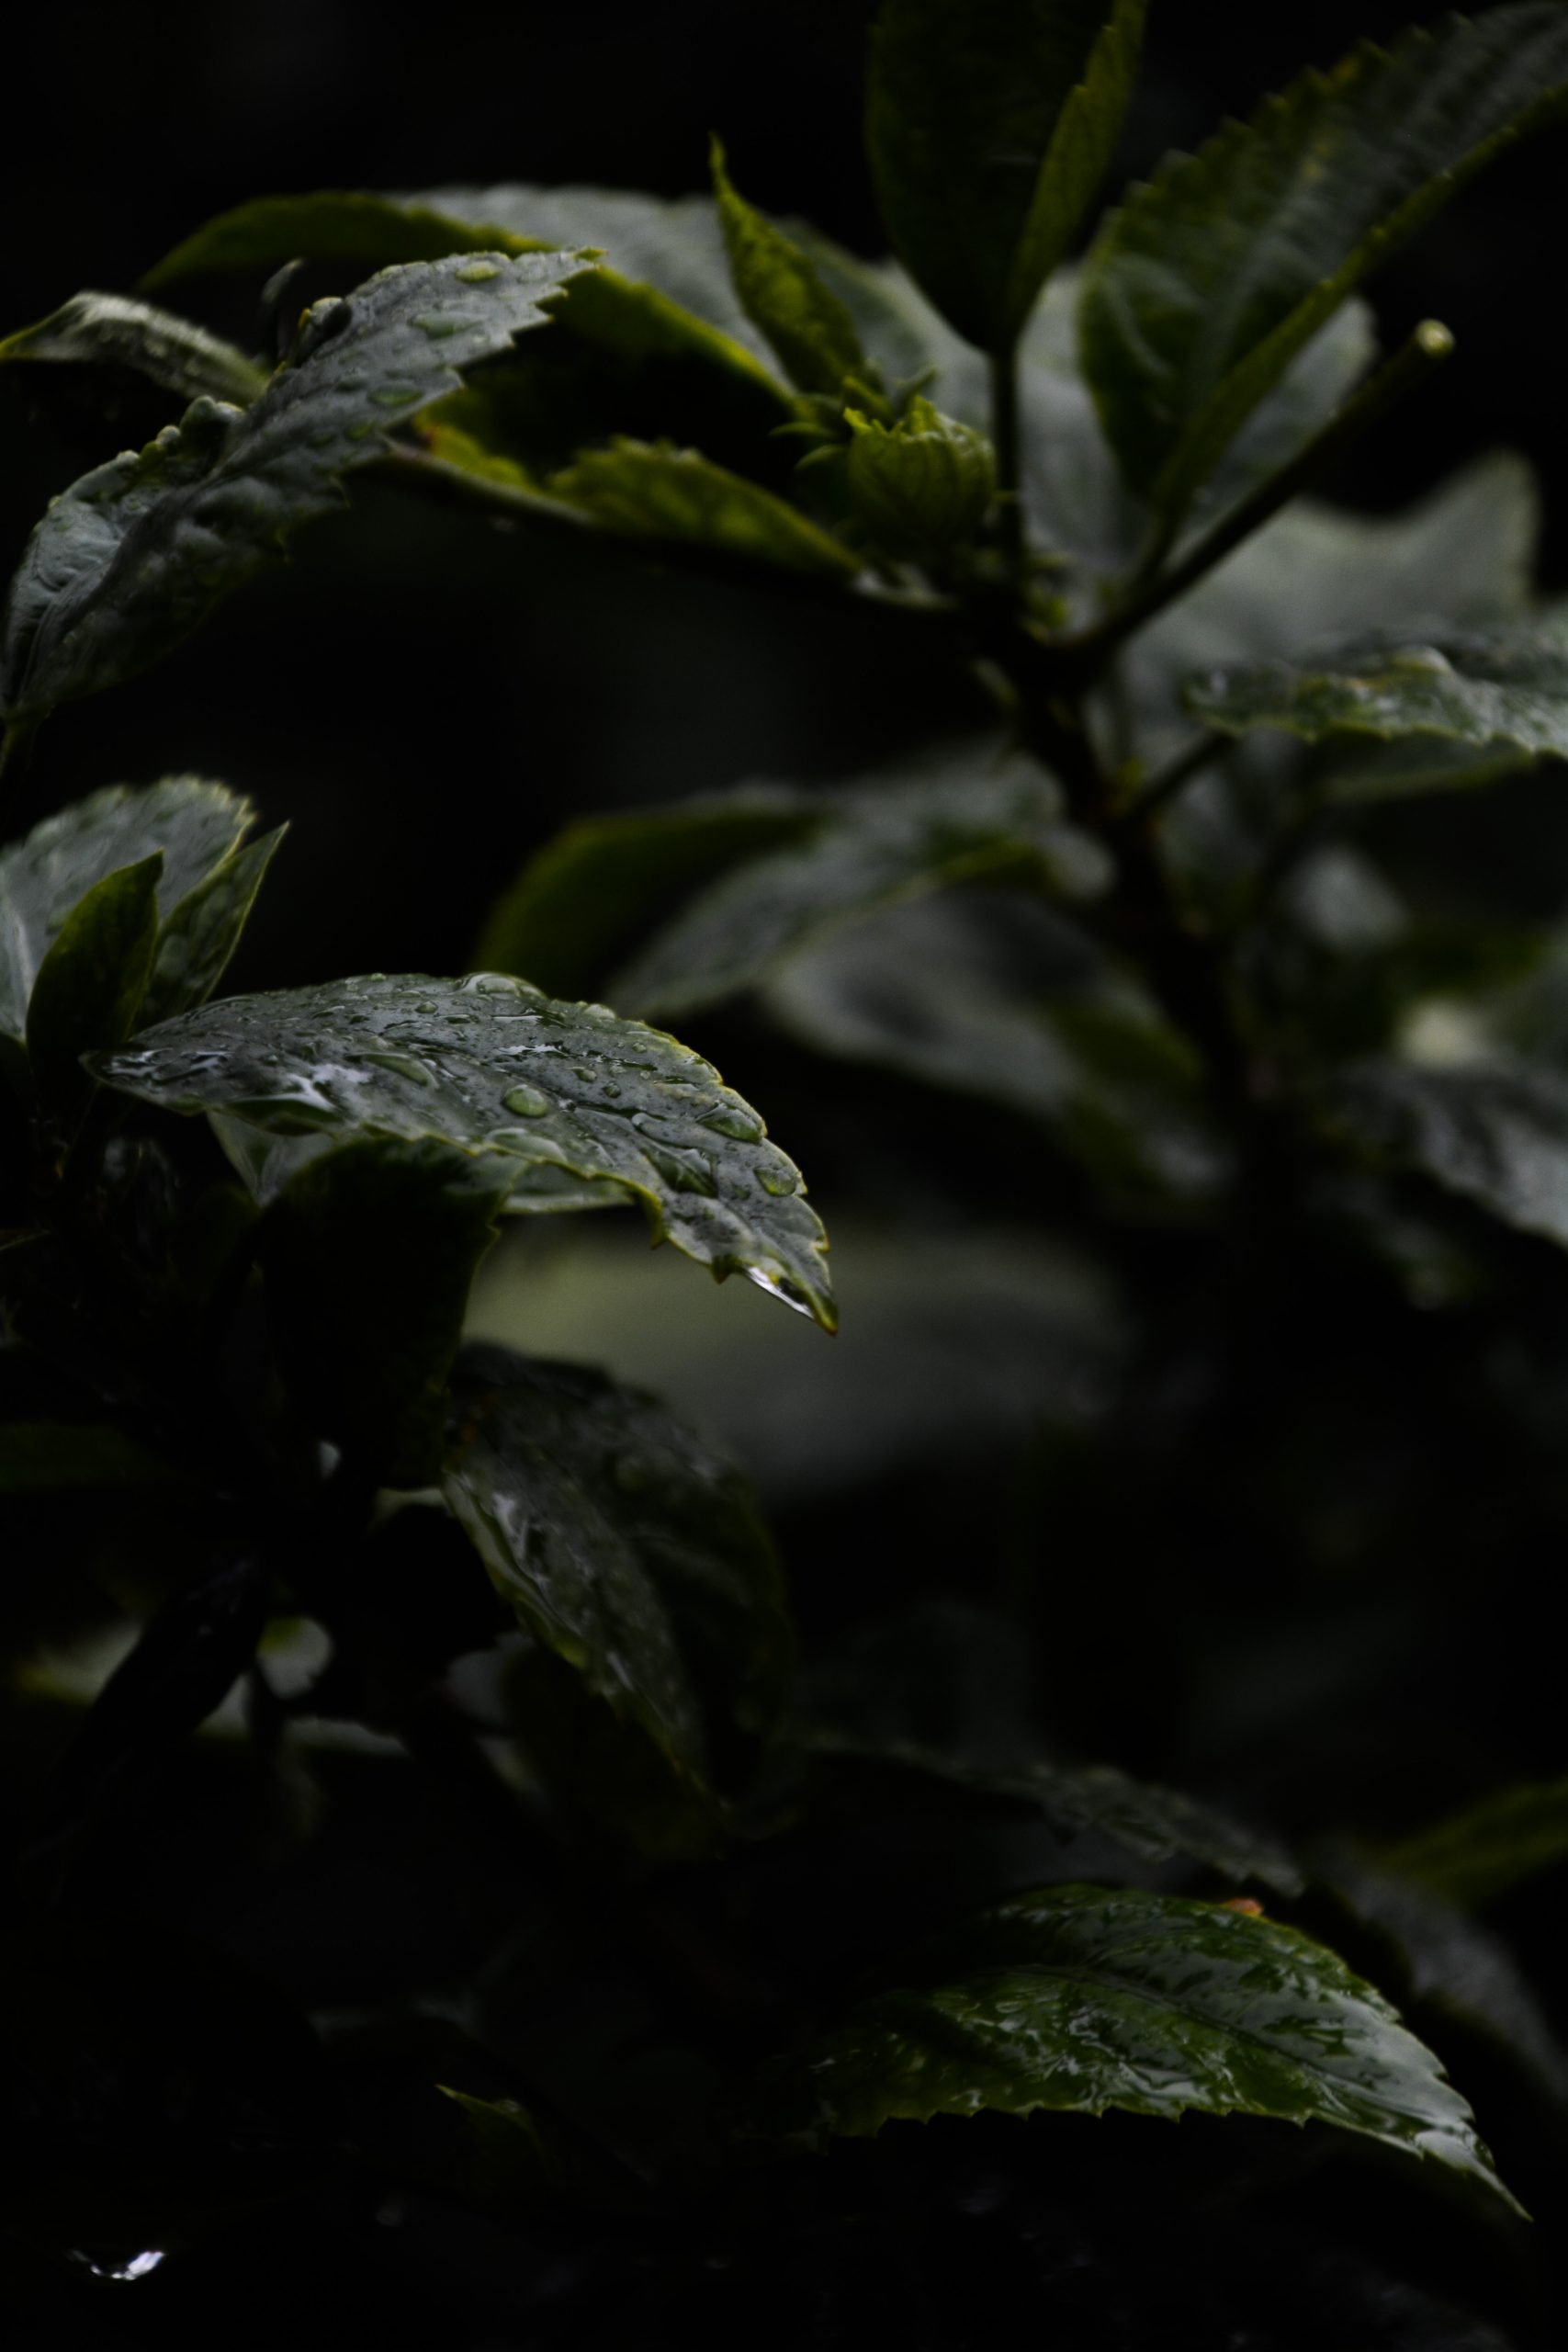 Wet Plant Leaves on Focus